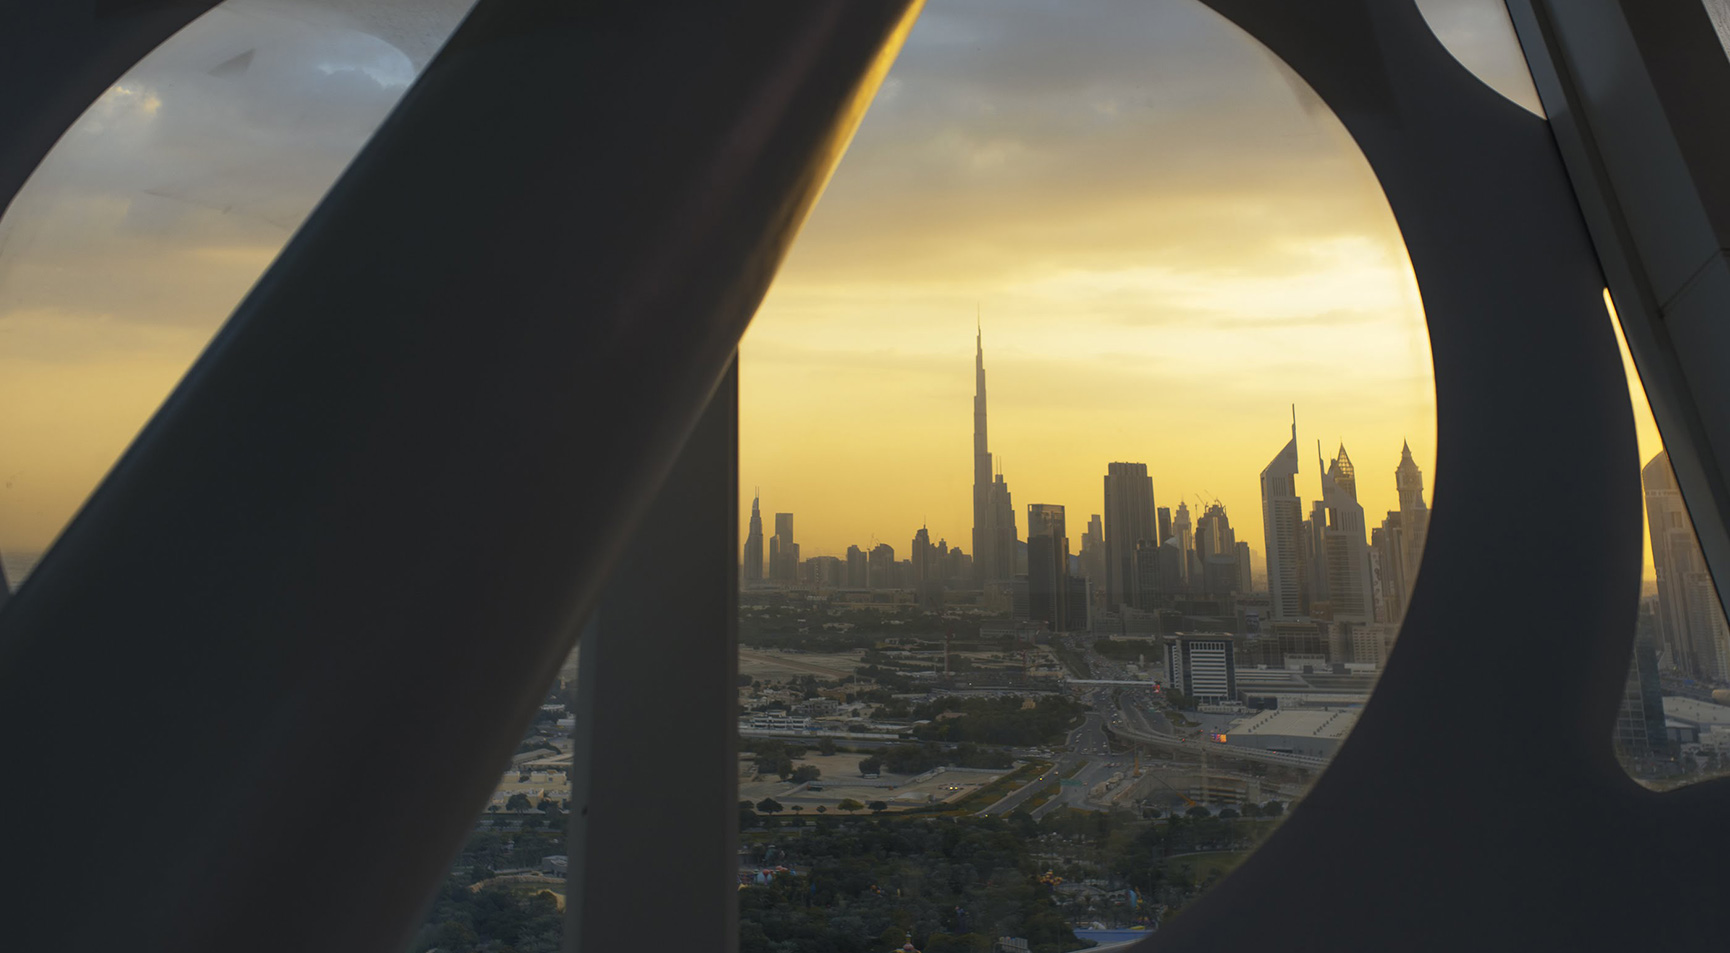 Present Dubai